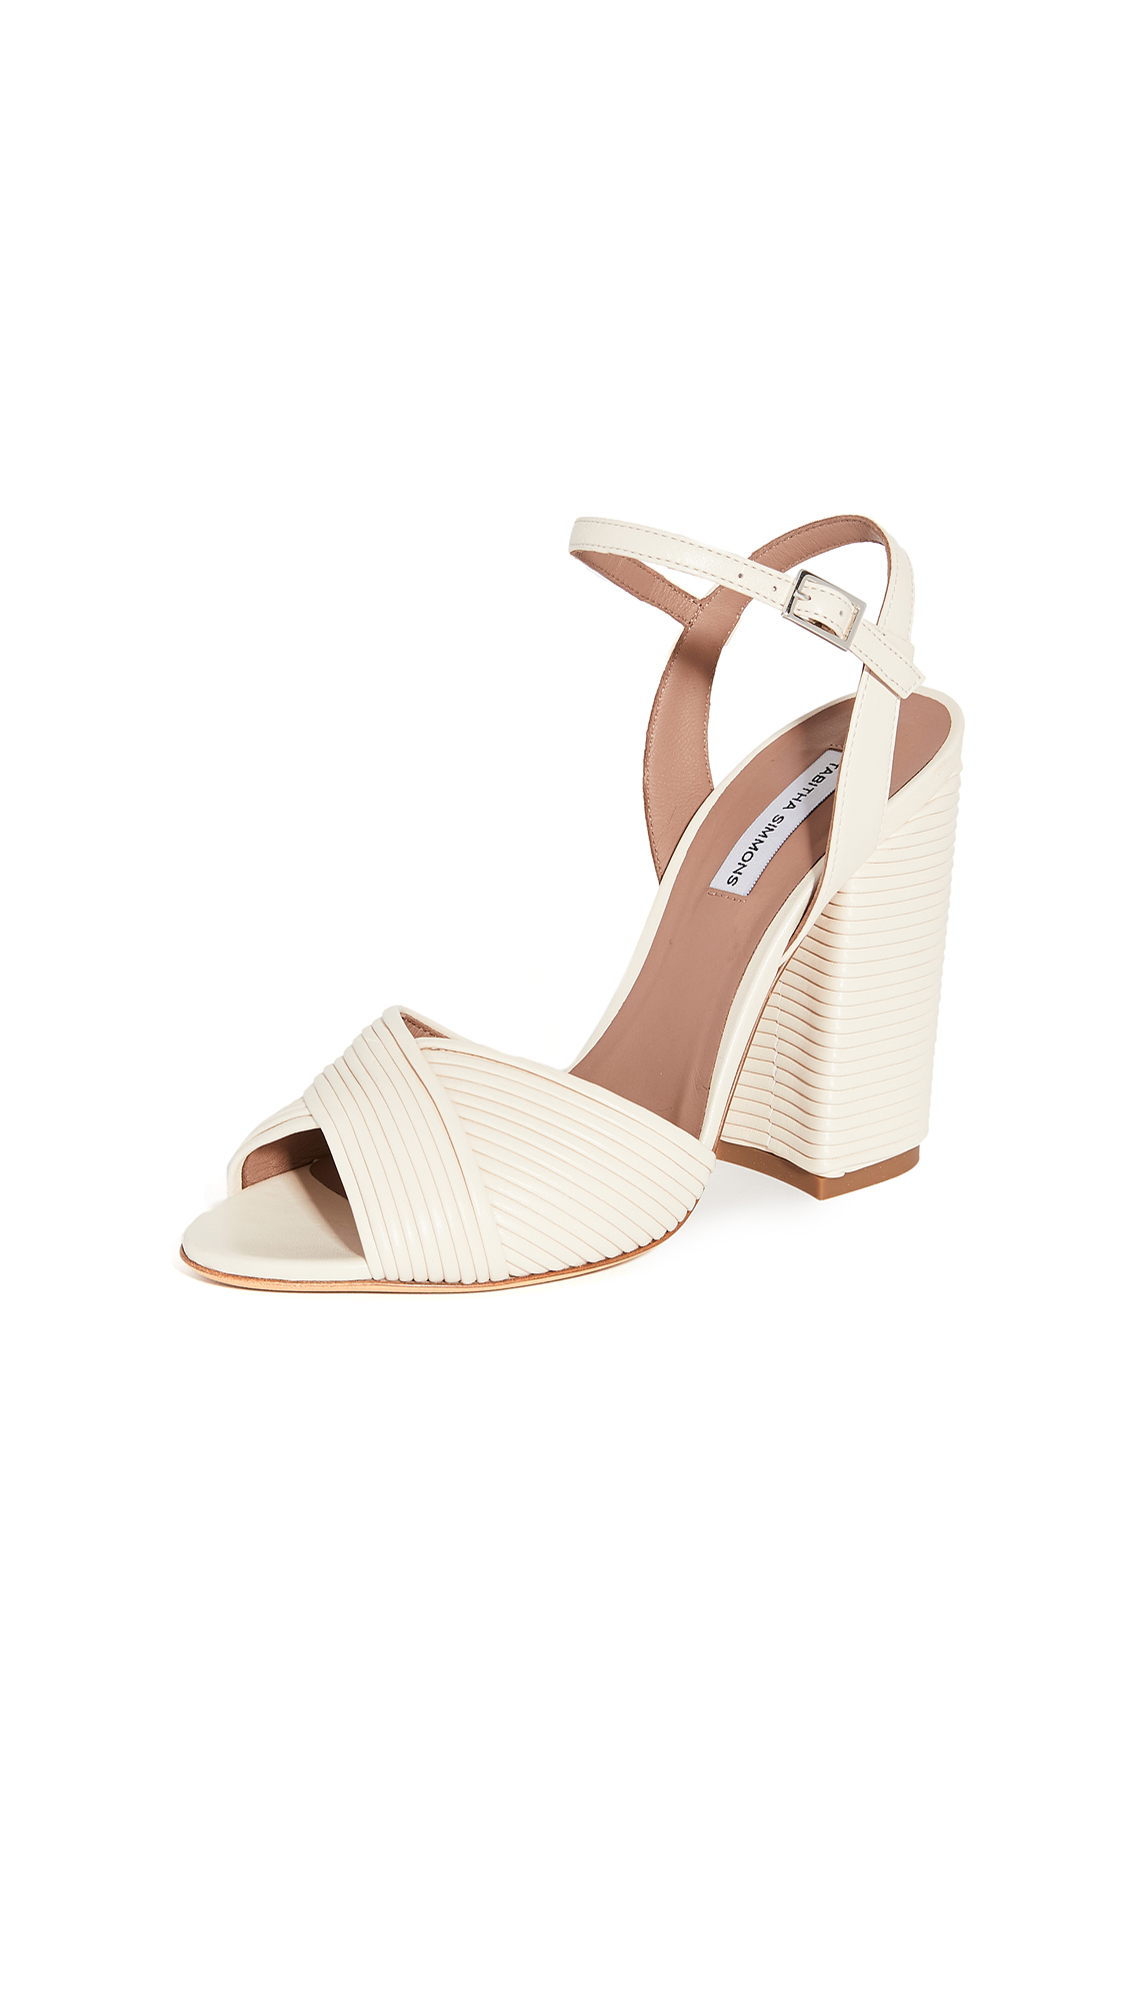 Buy Tabitha Simmons Kali Sandals online, shop Tabitha Simmons